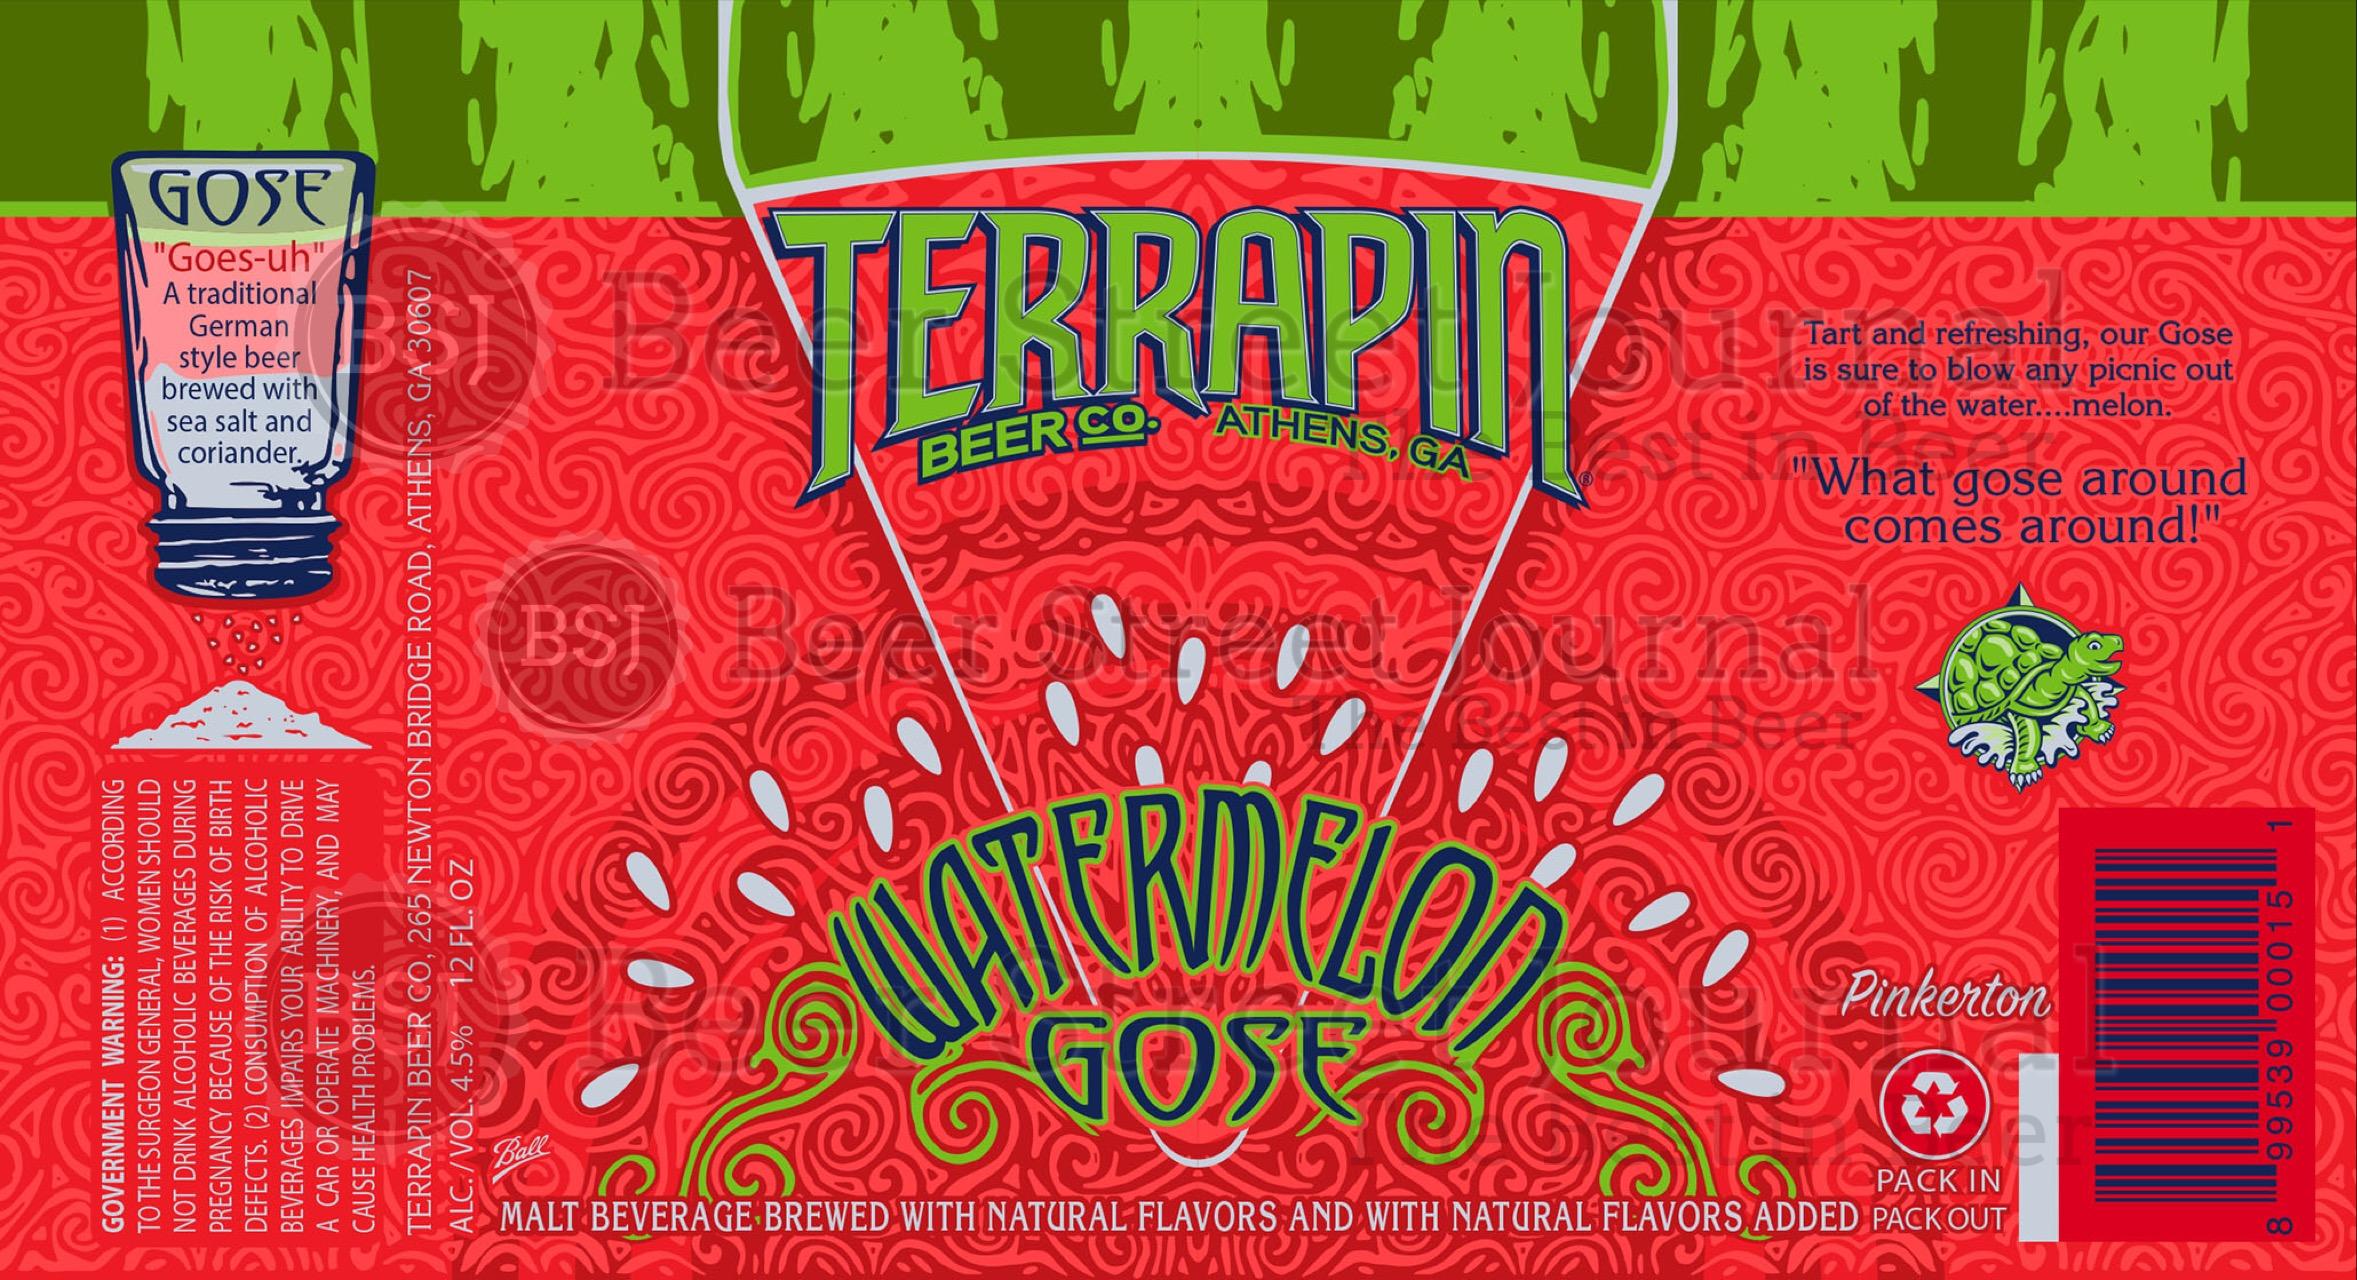 terrapin watermelon gose